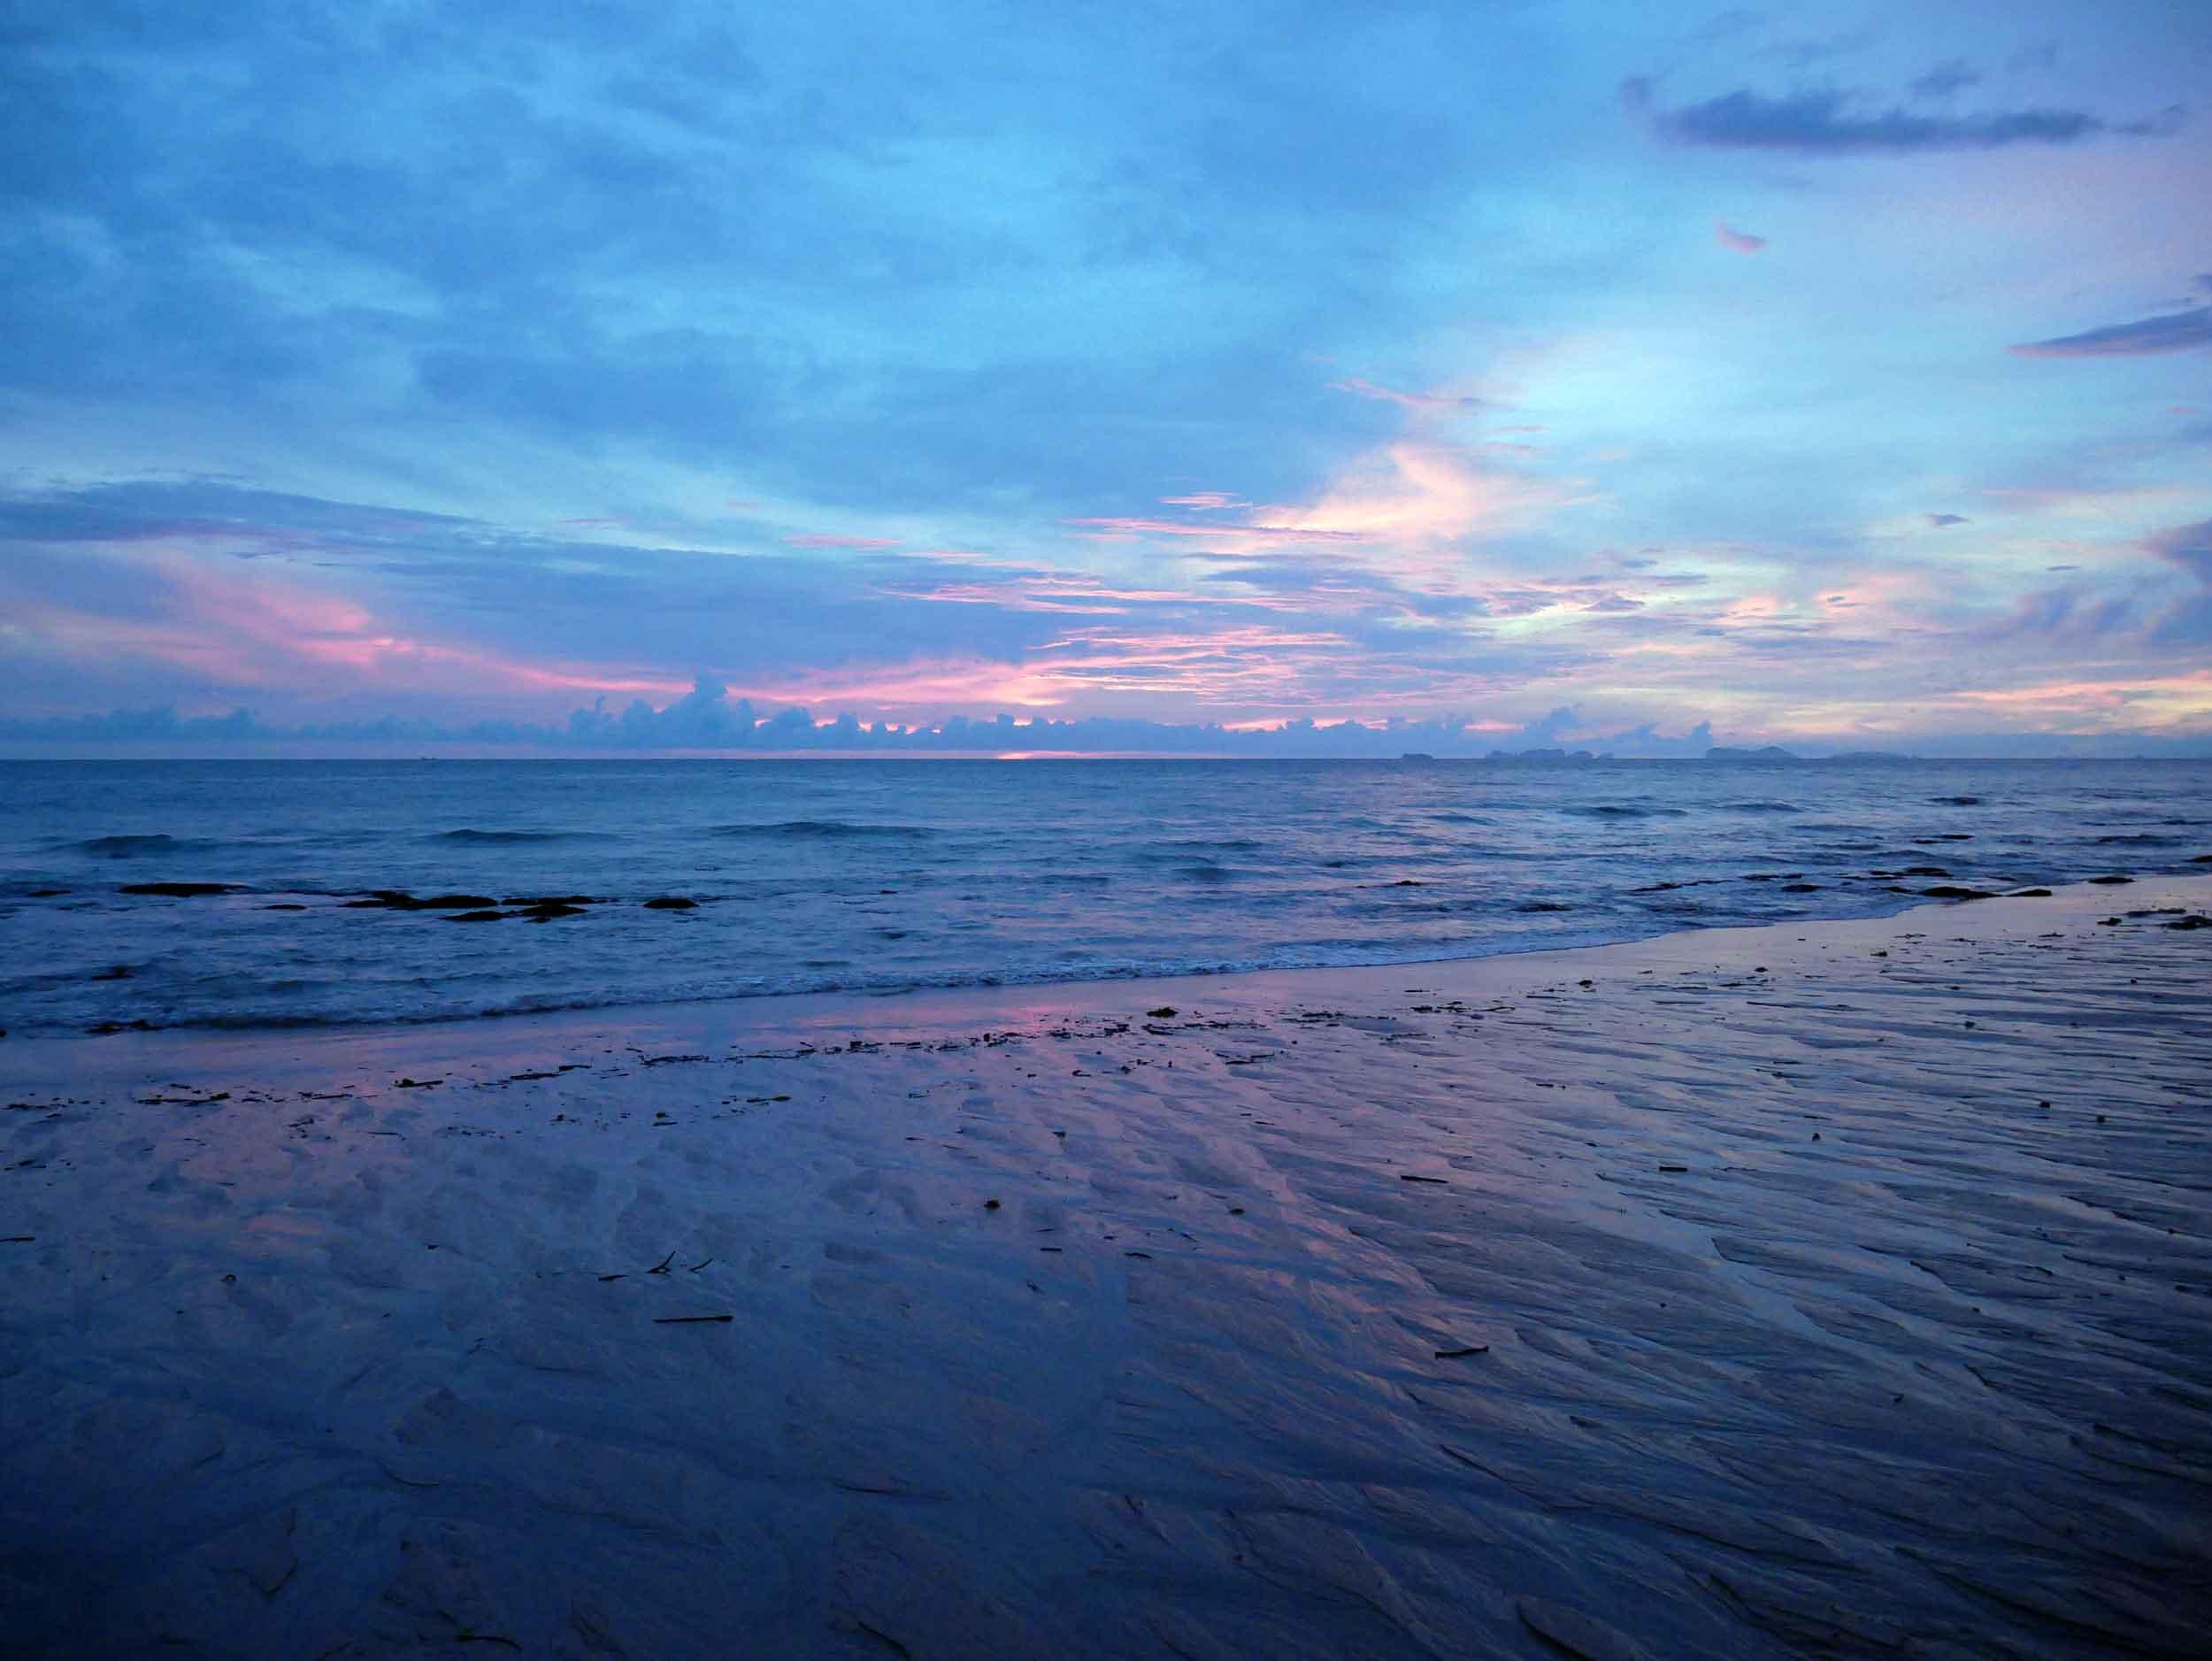 Koh Lanta's Klong Nin beach offered dramatic, stunning sunsets nearly every night we were on the island.